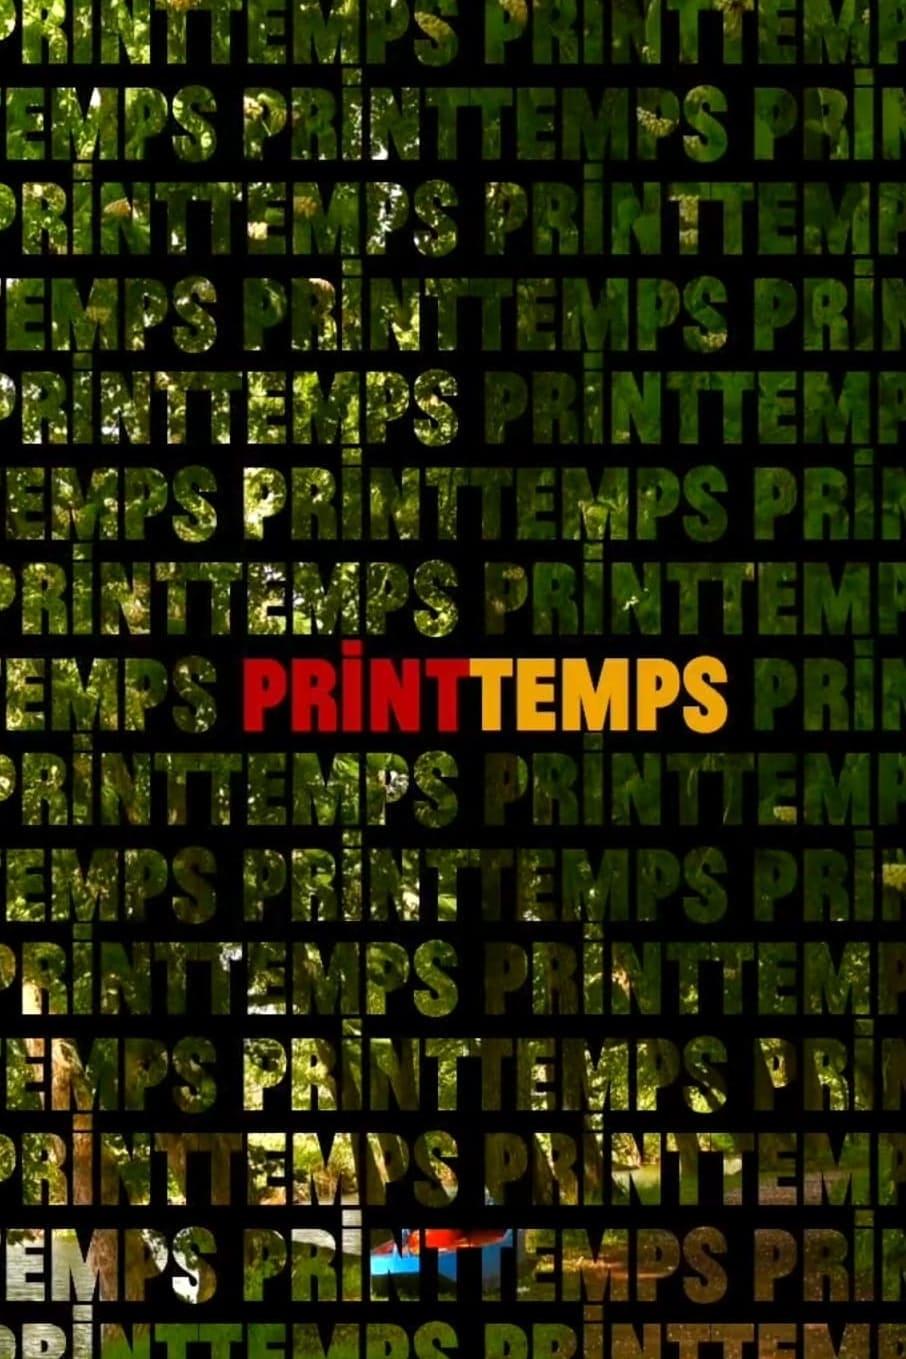 Printtemps